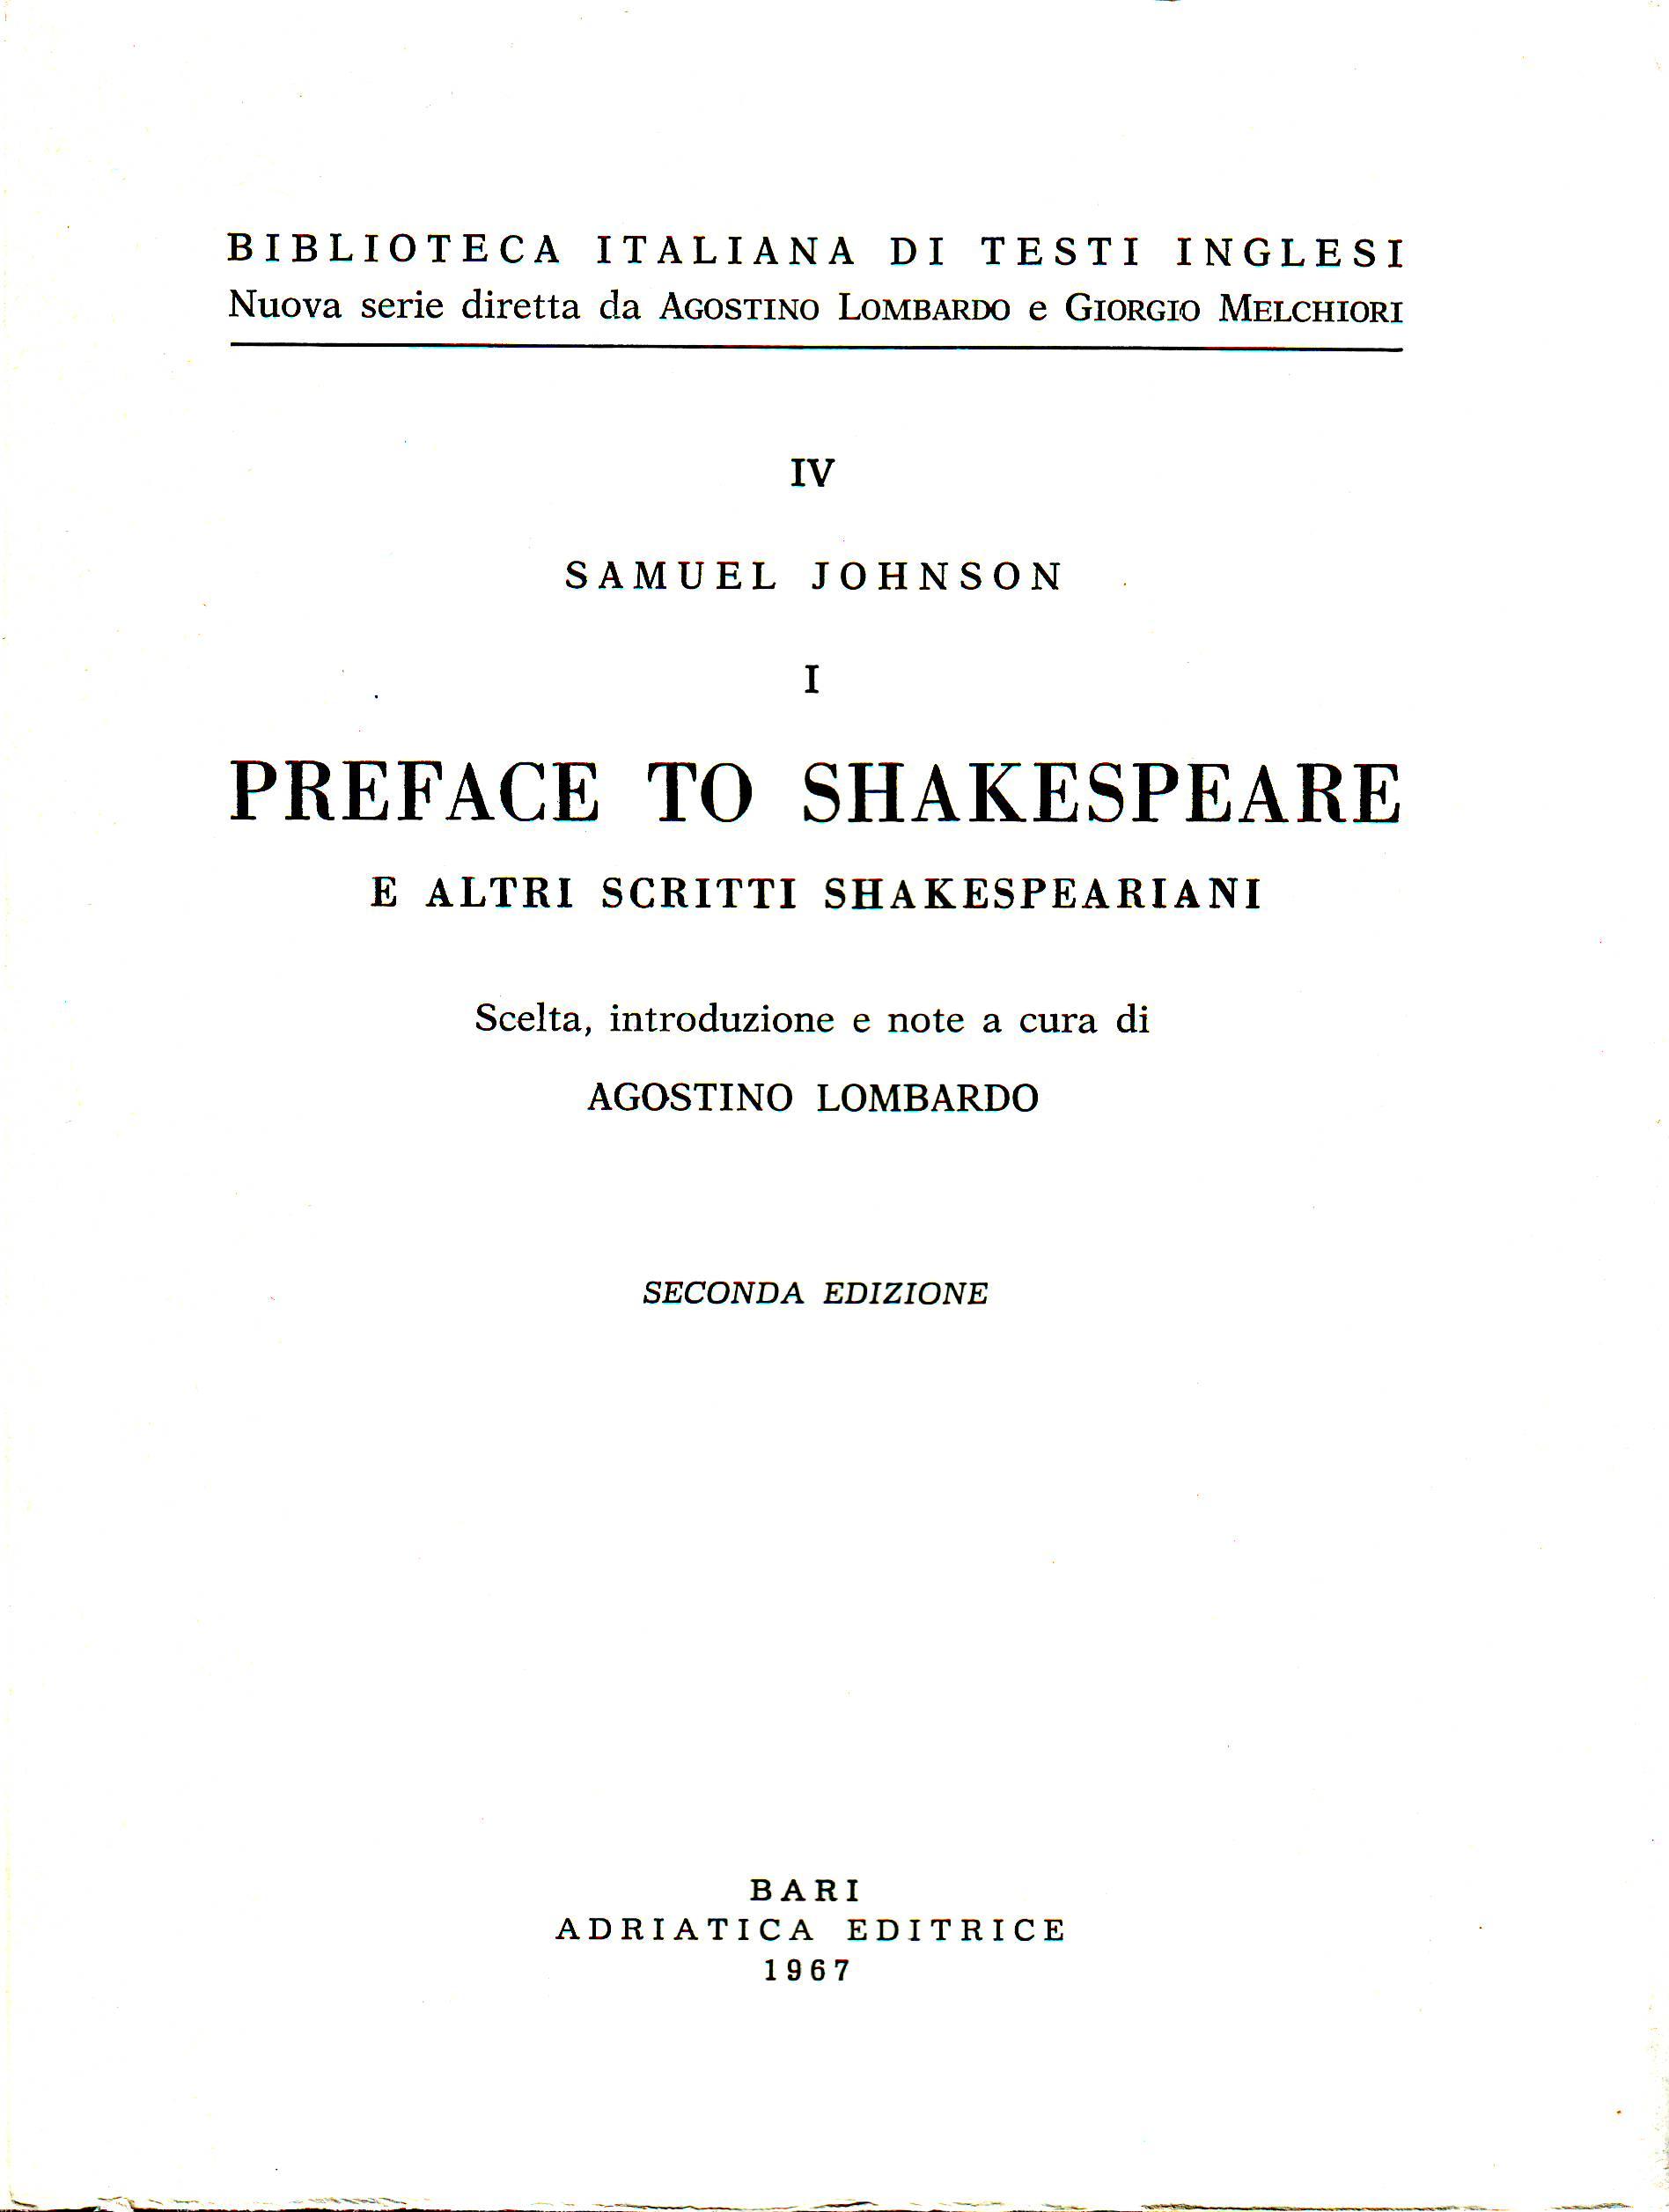 Preface to Shakespea...